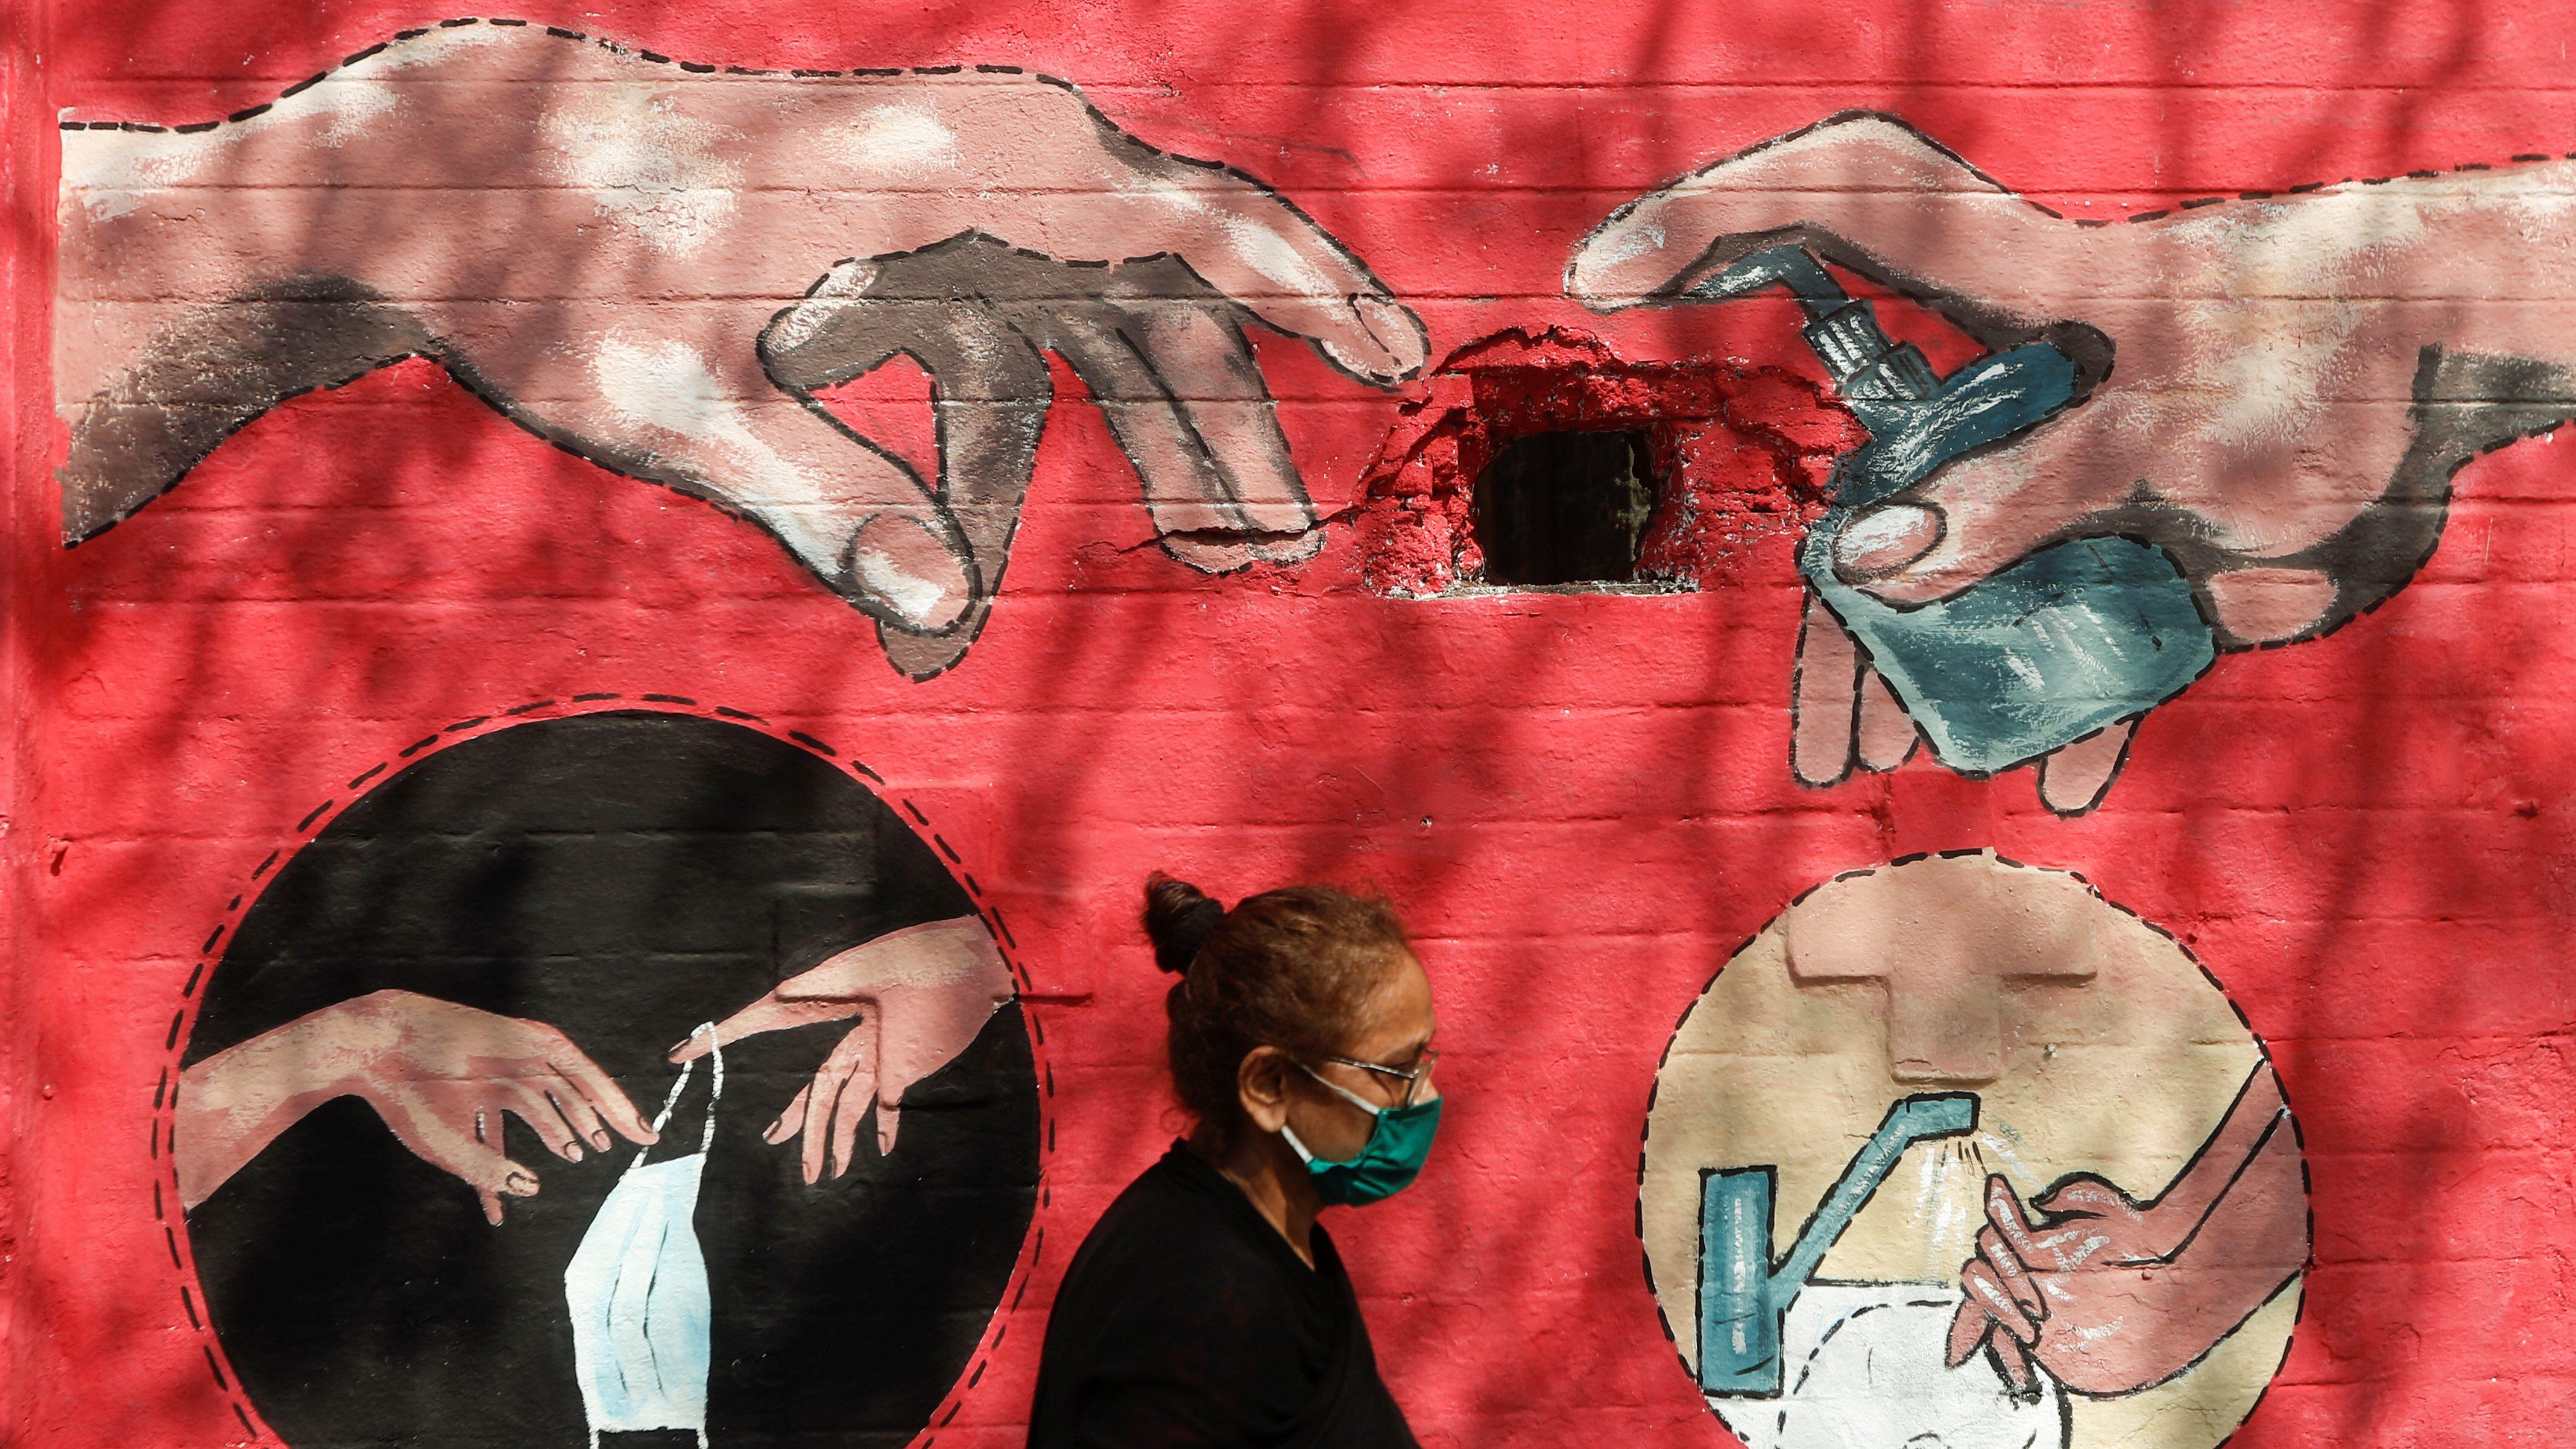 A woman walks past a graffiti, on a street, amidst the spread of the coronavirus disease (COVID-19) in Mumbai